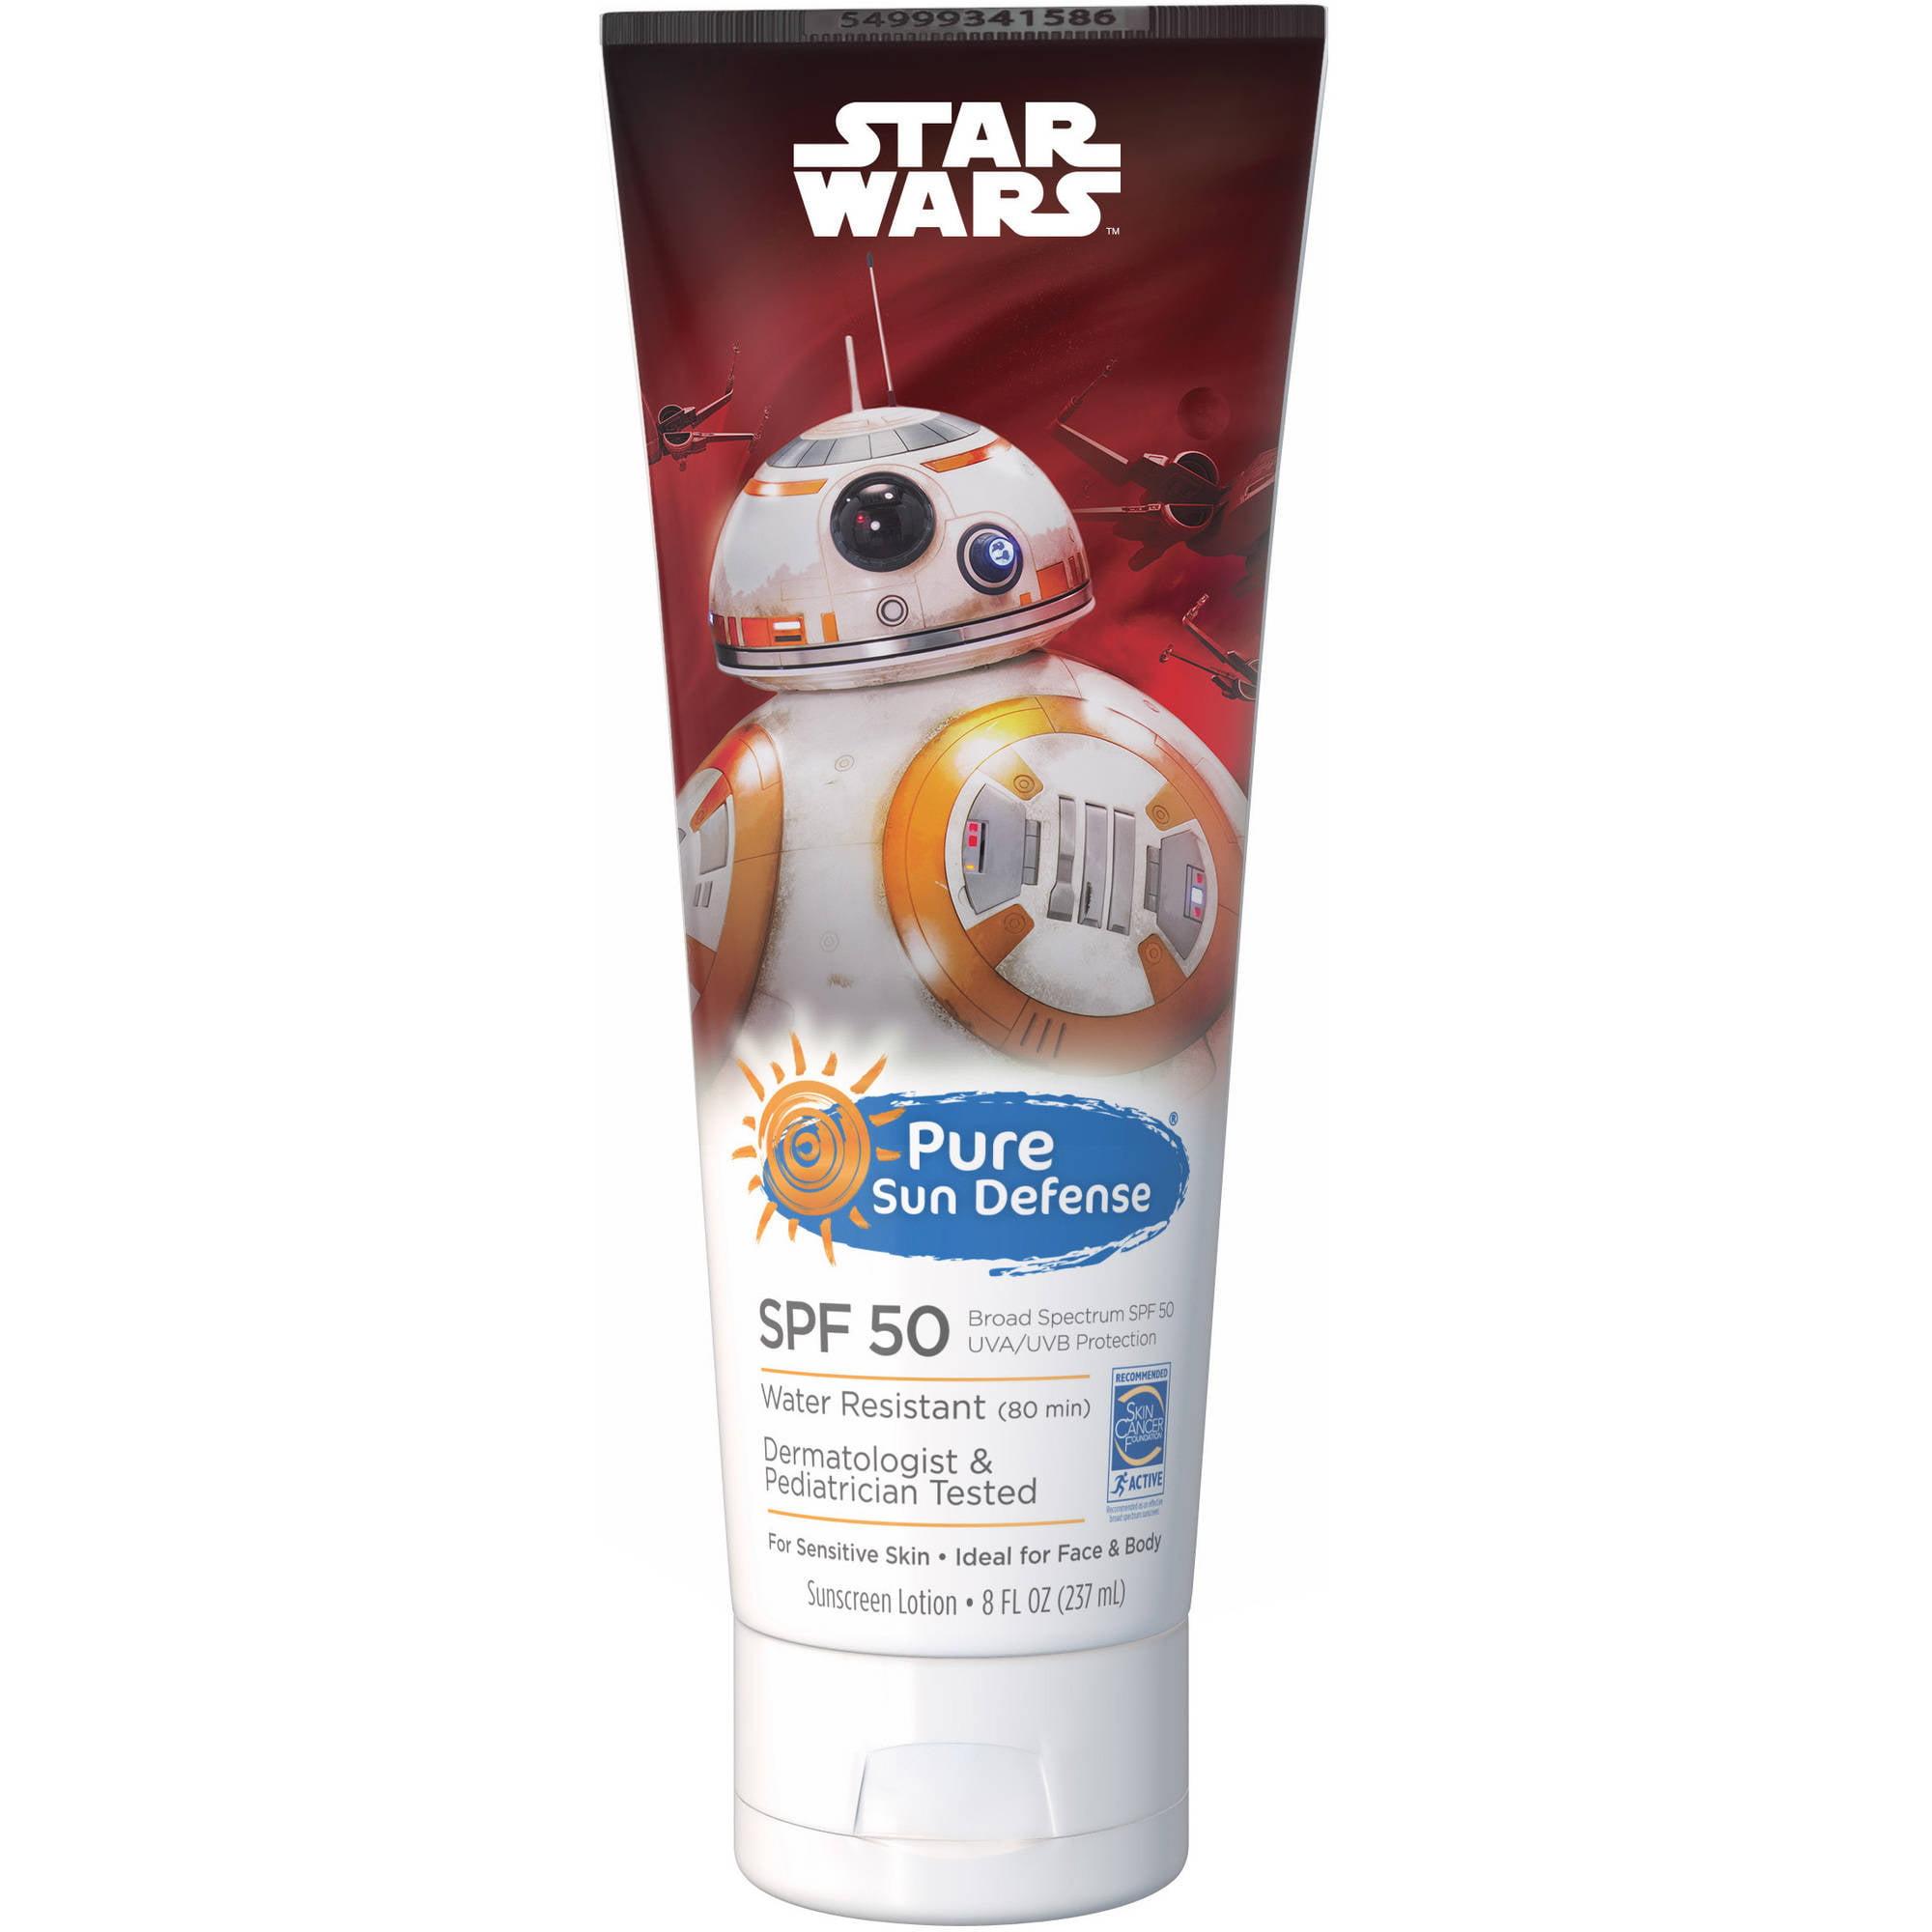 Pure Sun Defense Star Wars Sunscreen Lotion, SPF 50, 8 fl oz